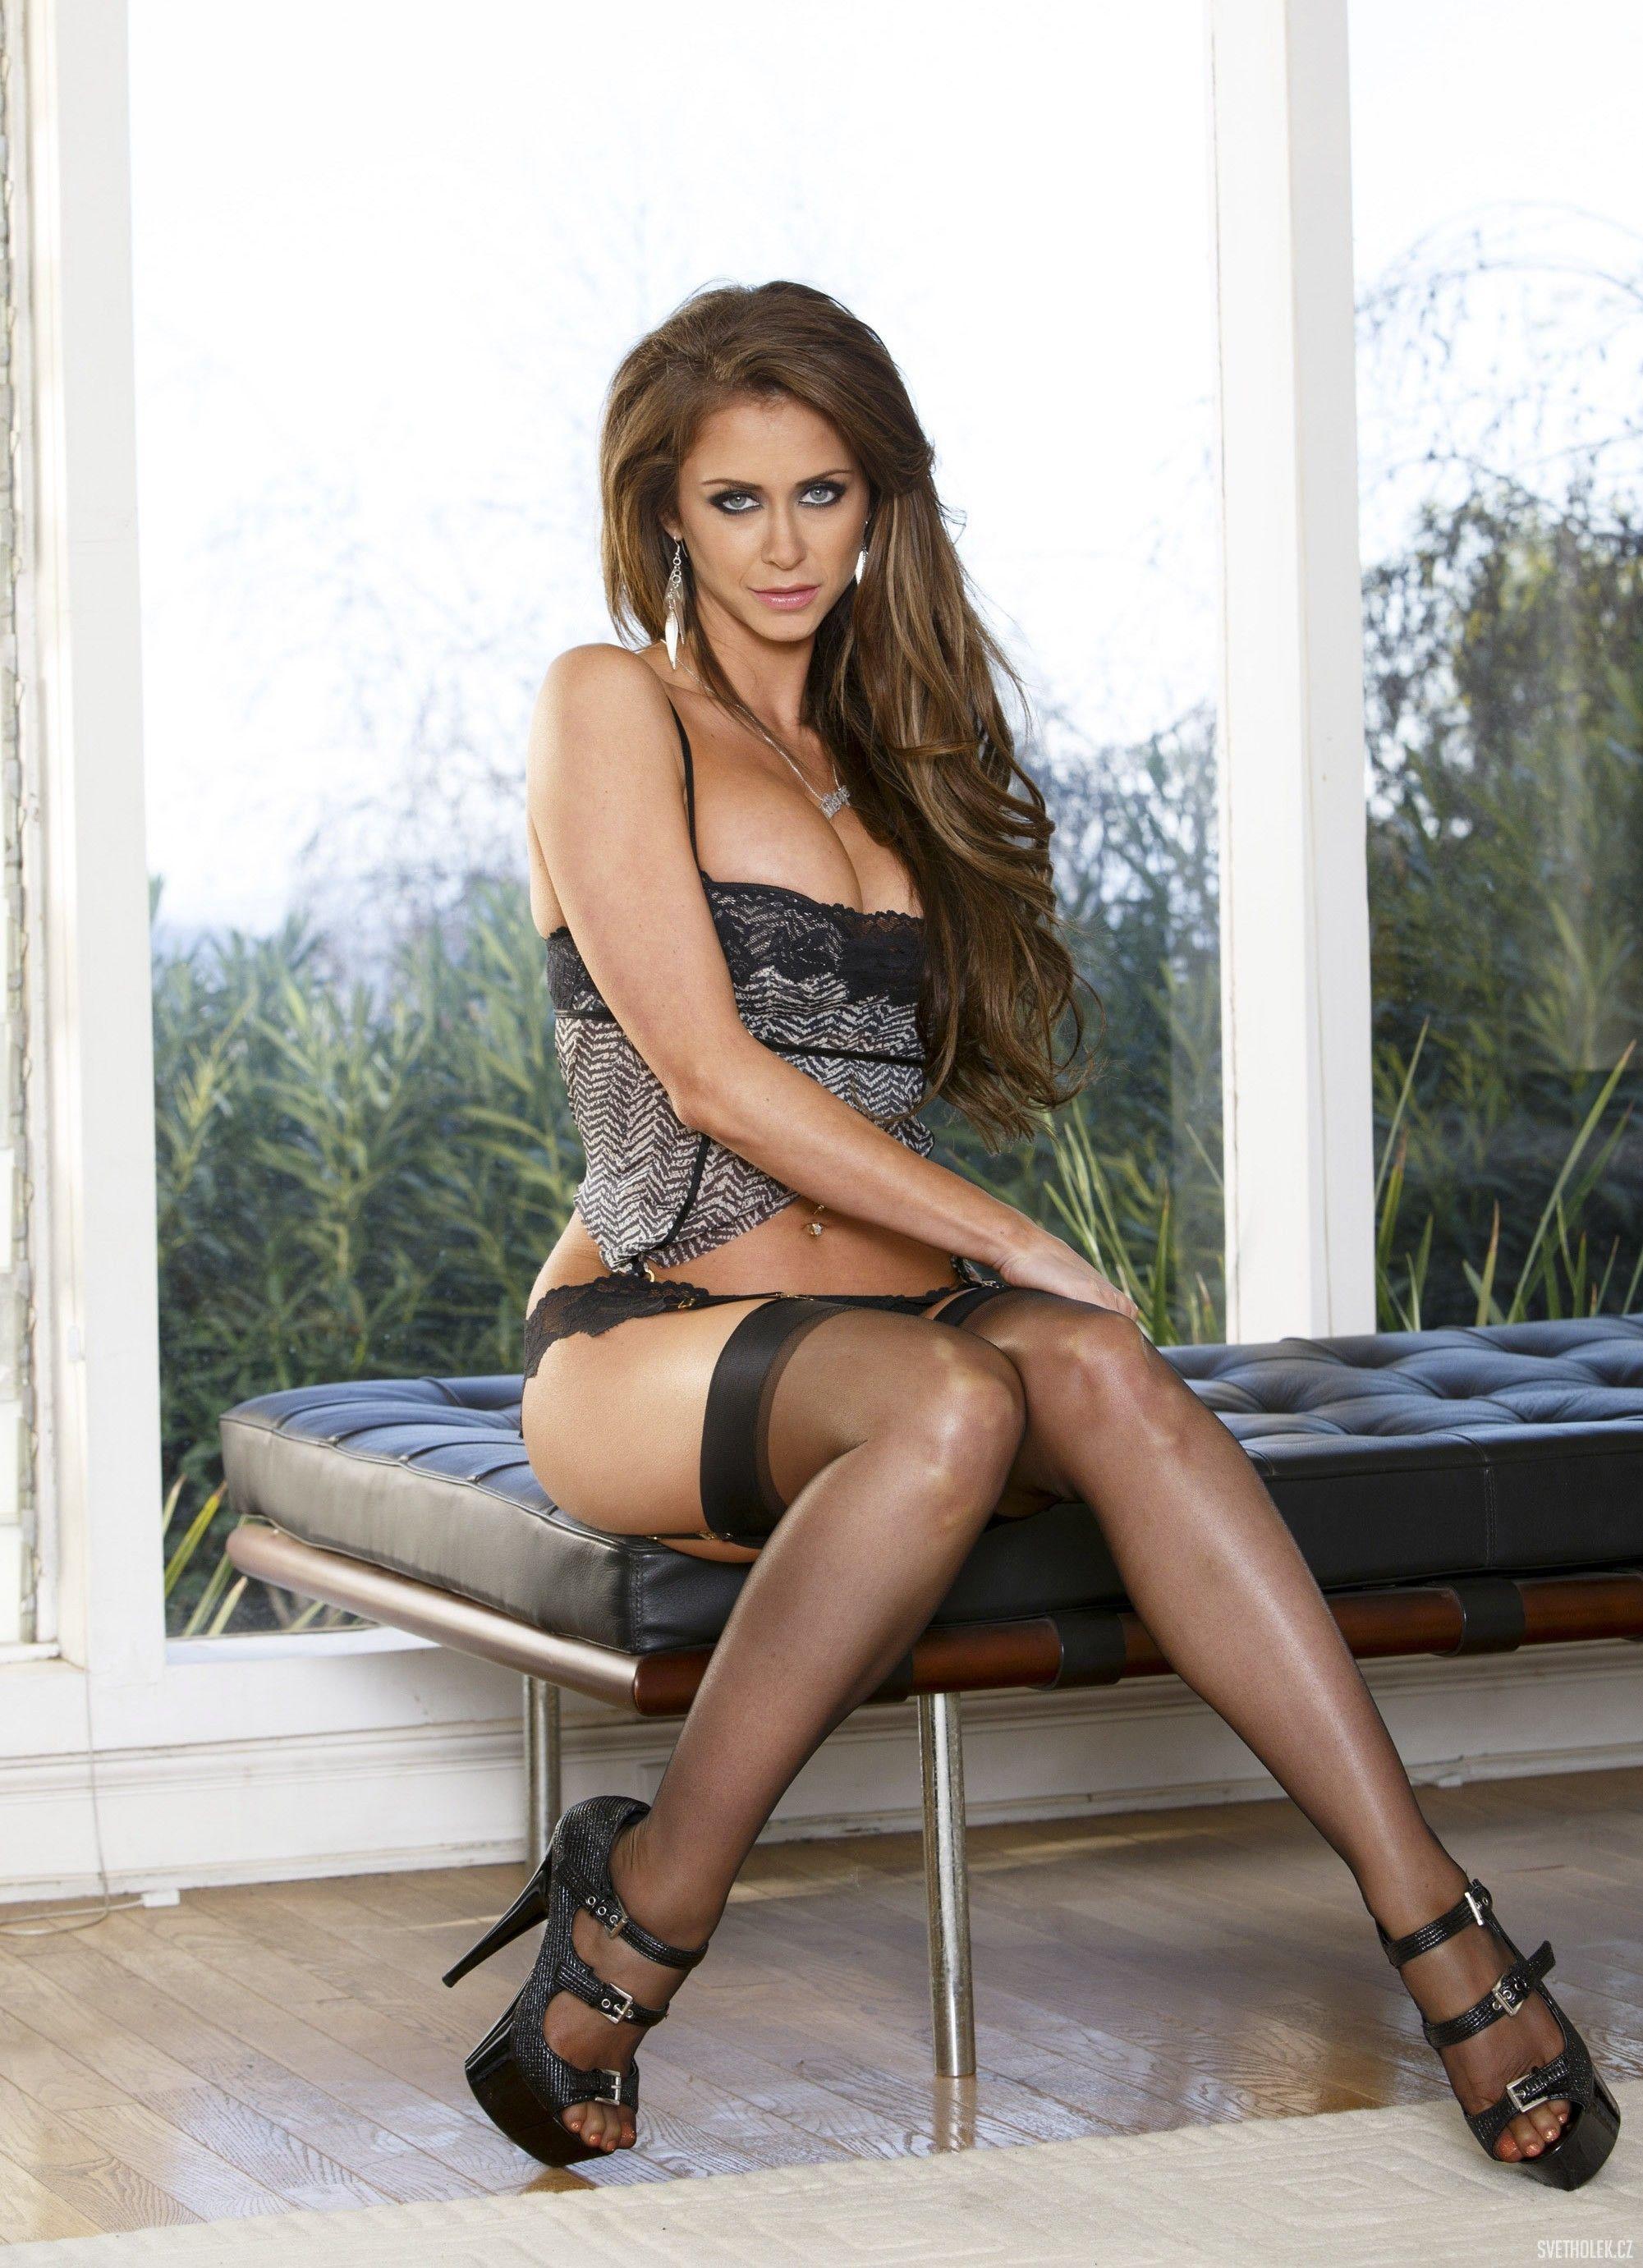 Emily addison lingerie stockings 9 nylon legs pinterest for Emily addison nyc